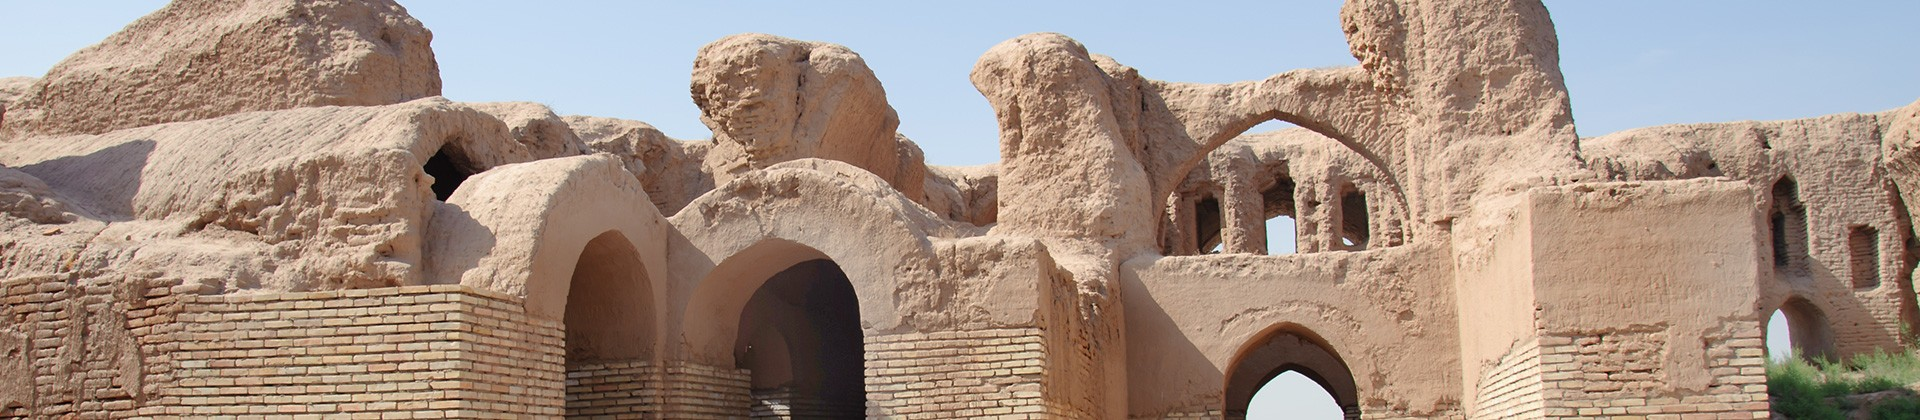 Kyrk Kyz Fortress - 1